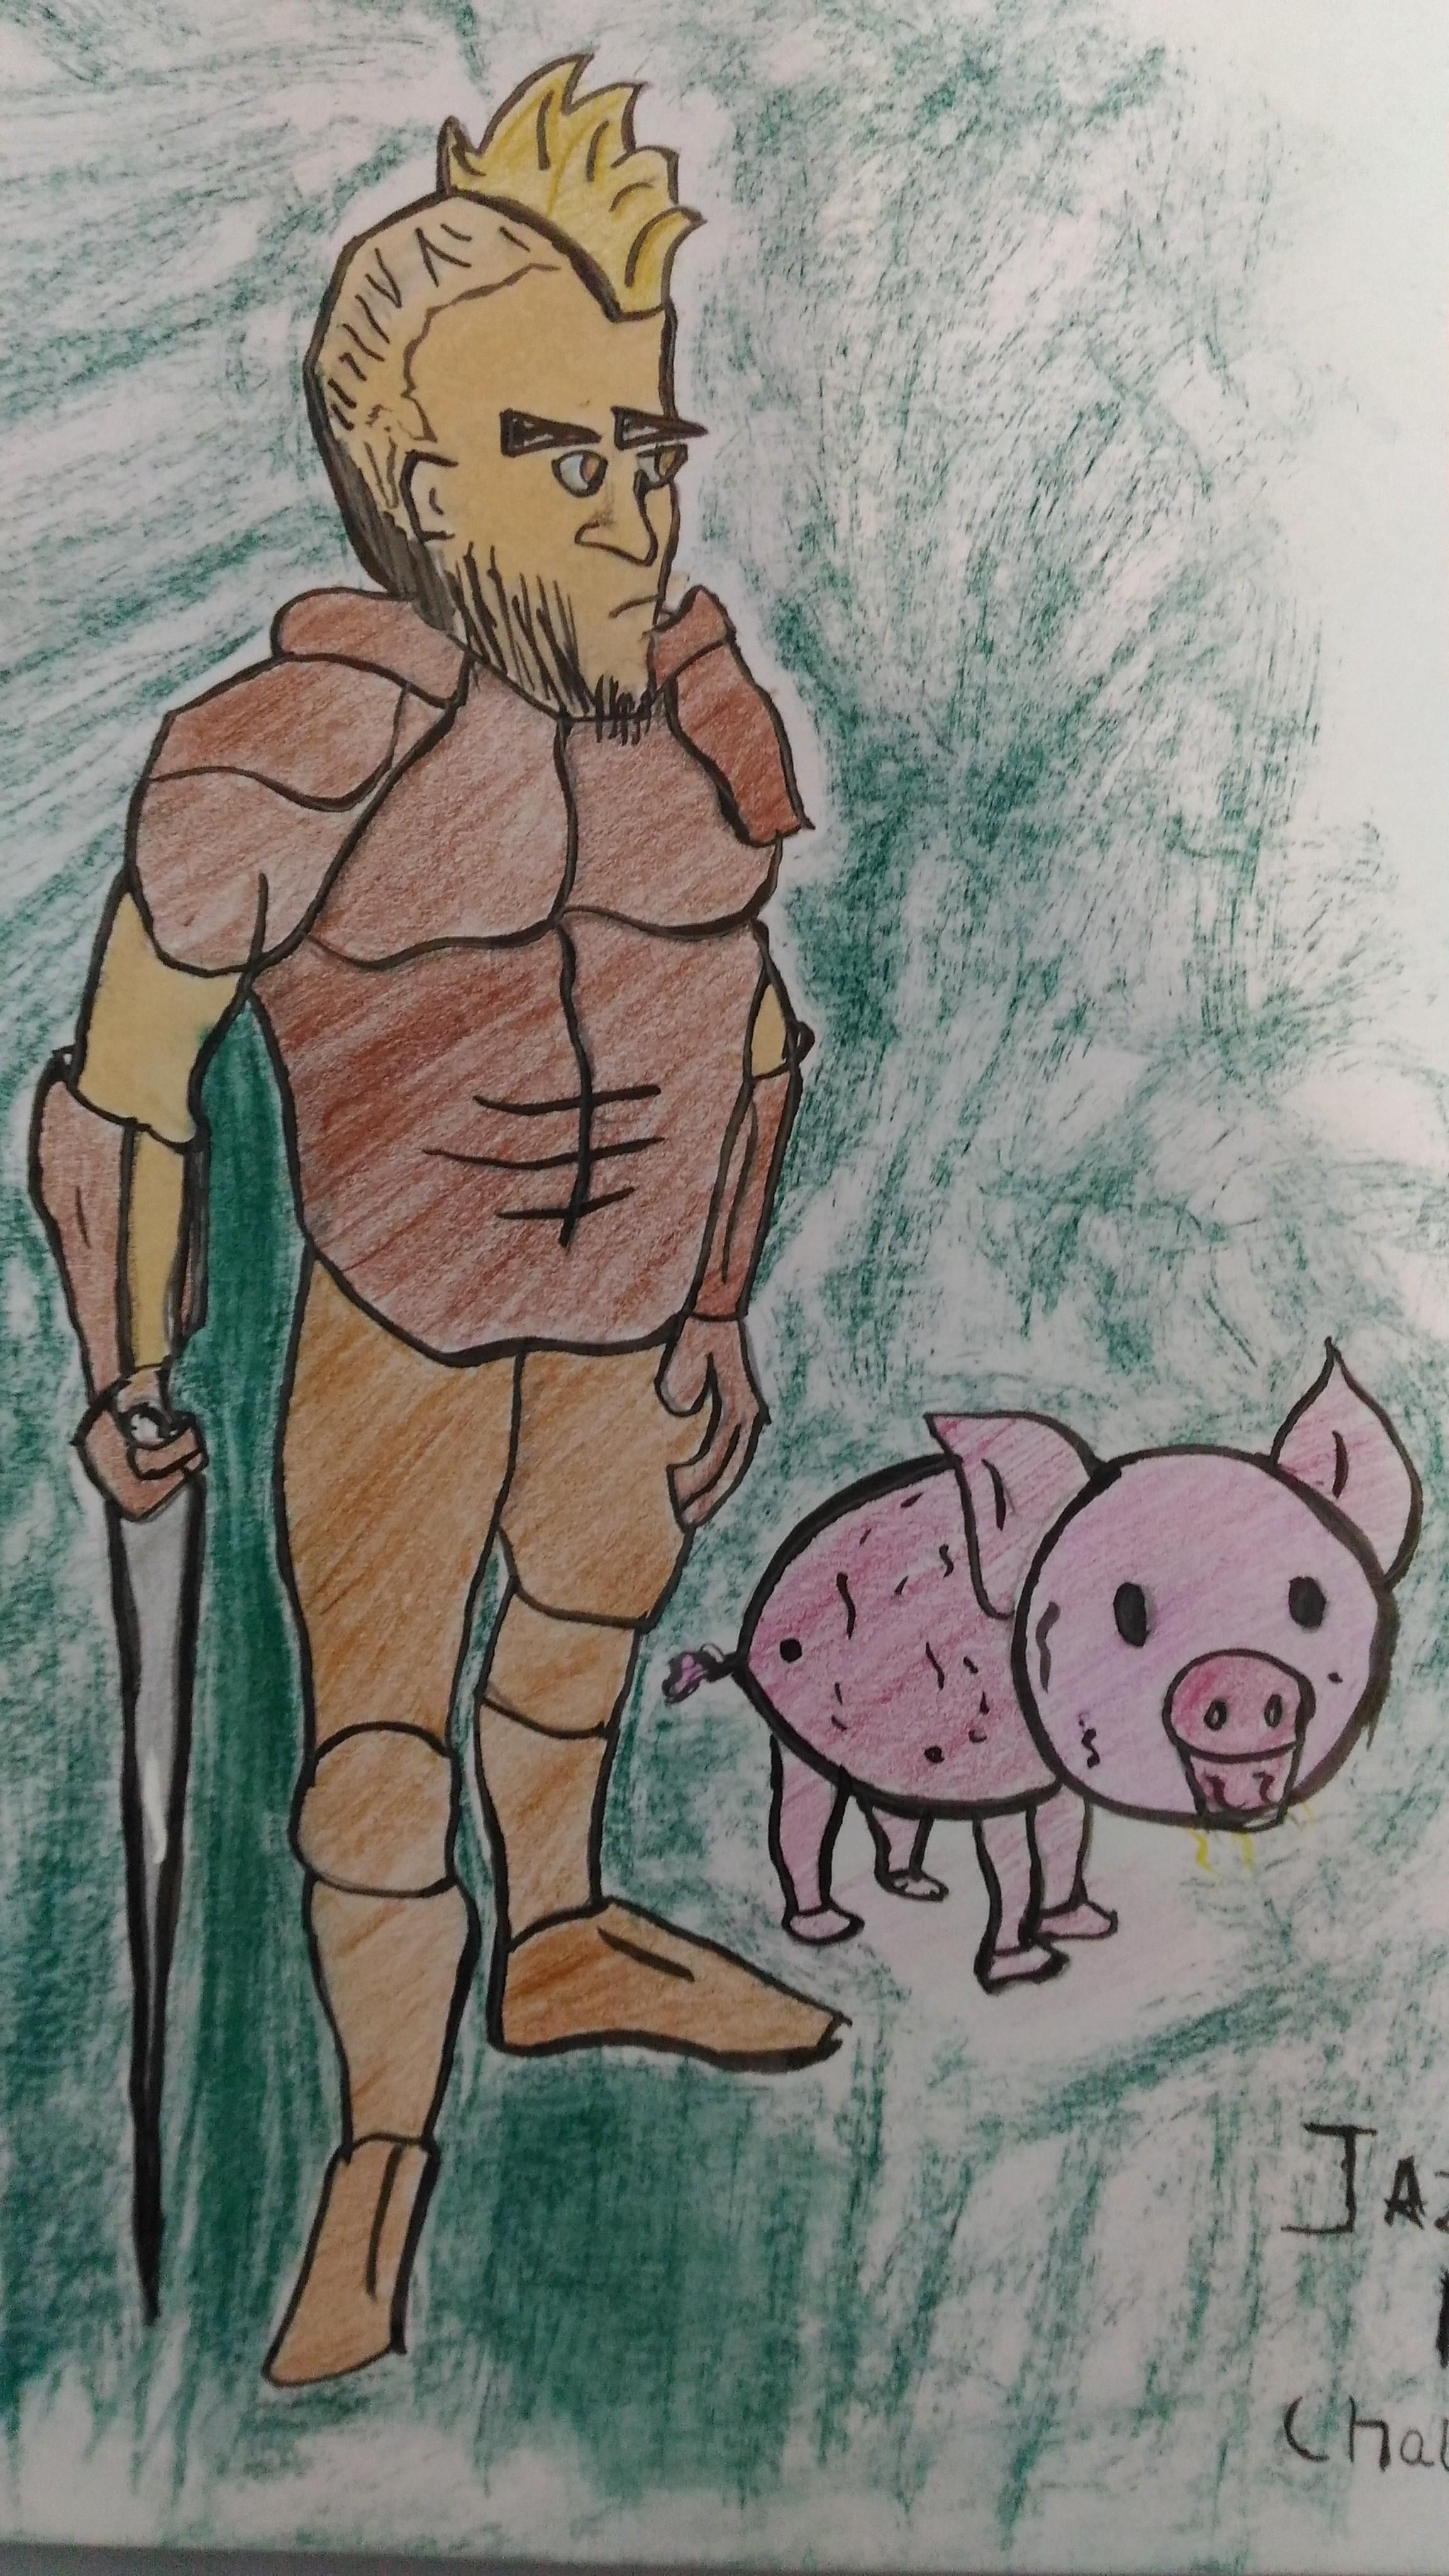 Reko and piggy